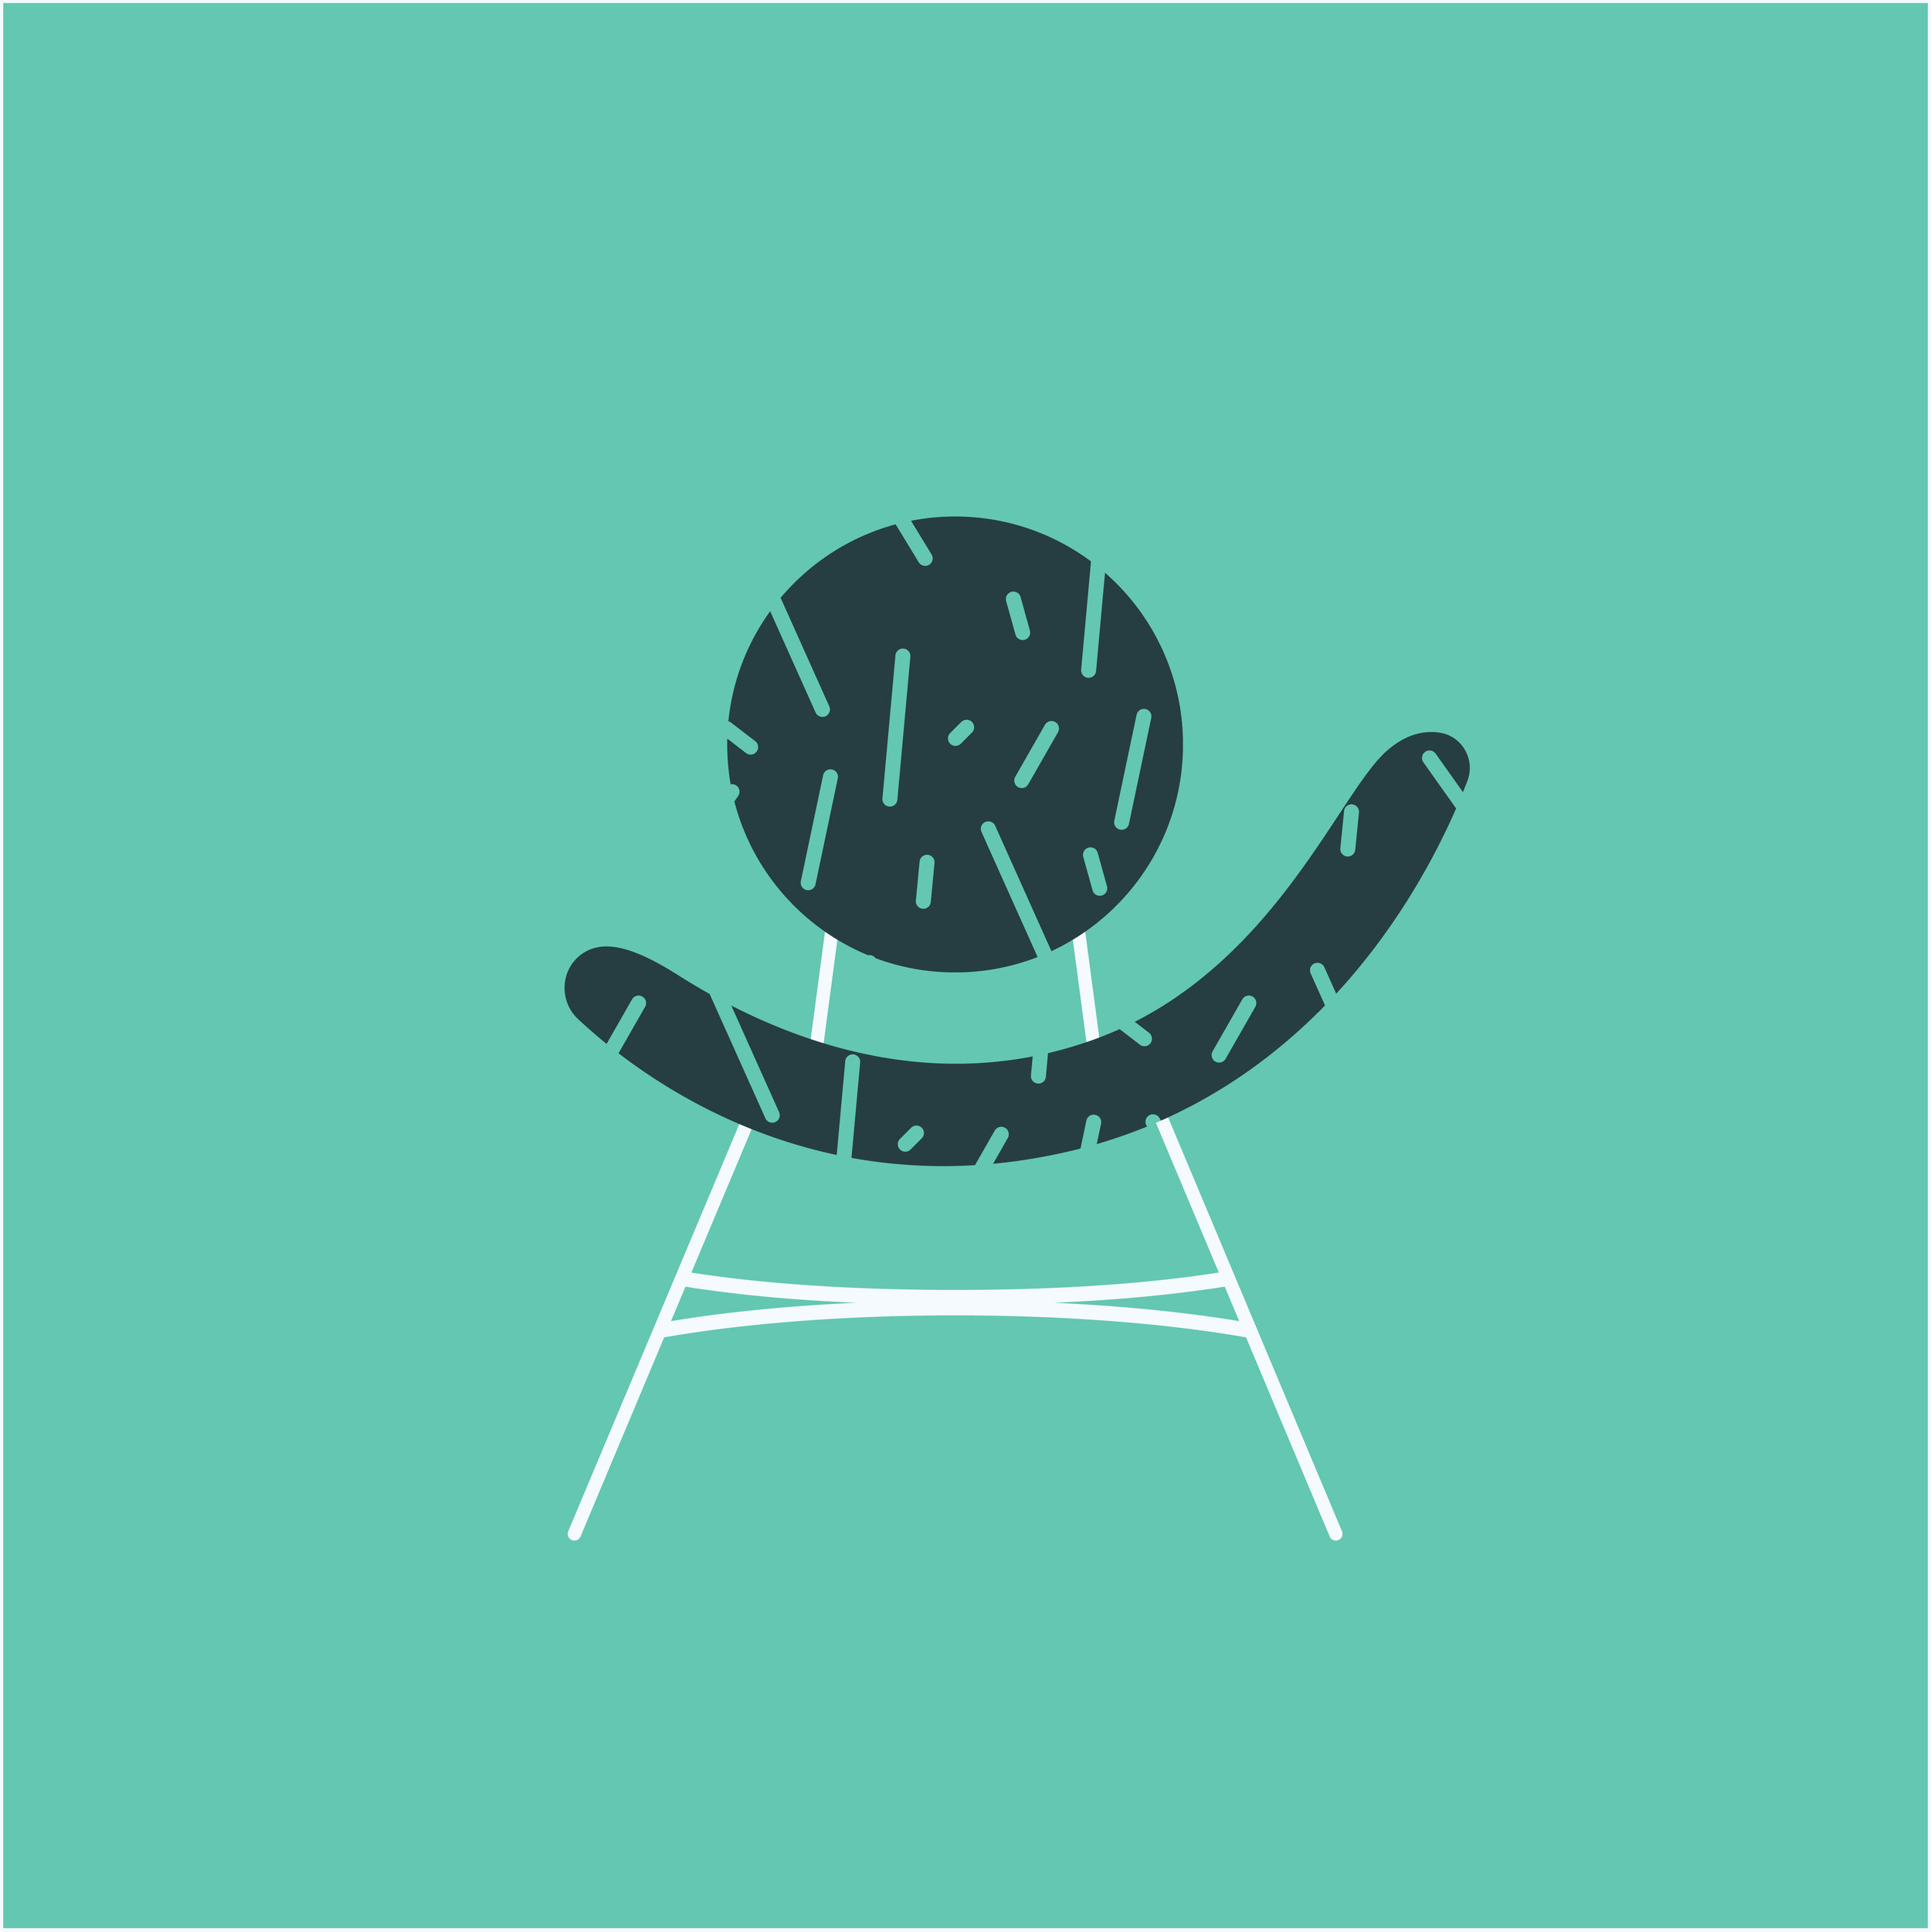 2_Pattern_Chair-02.jpg